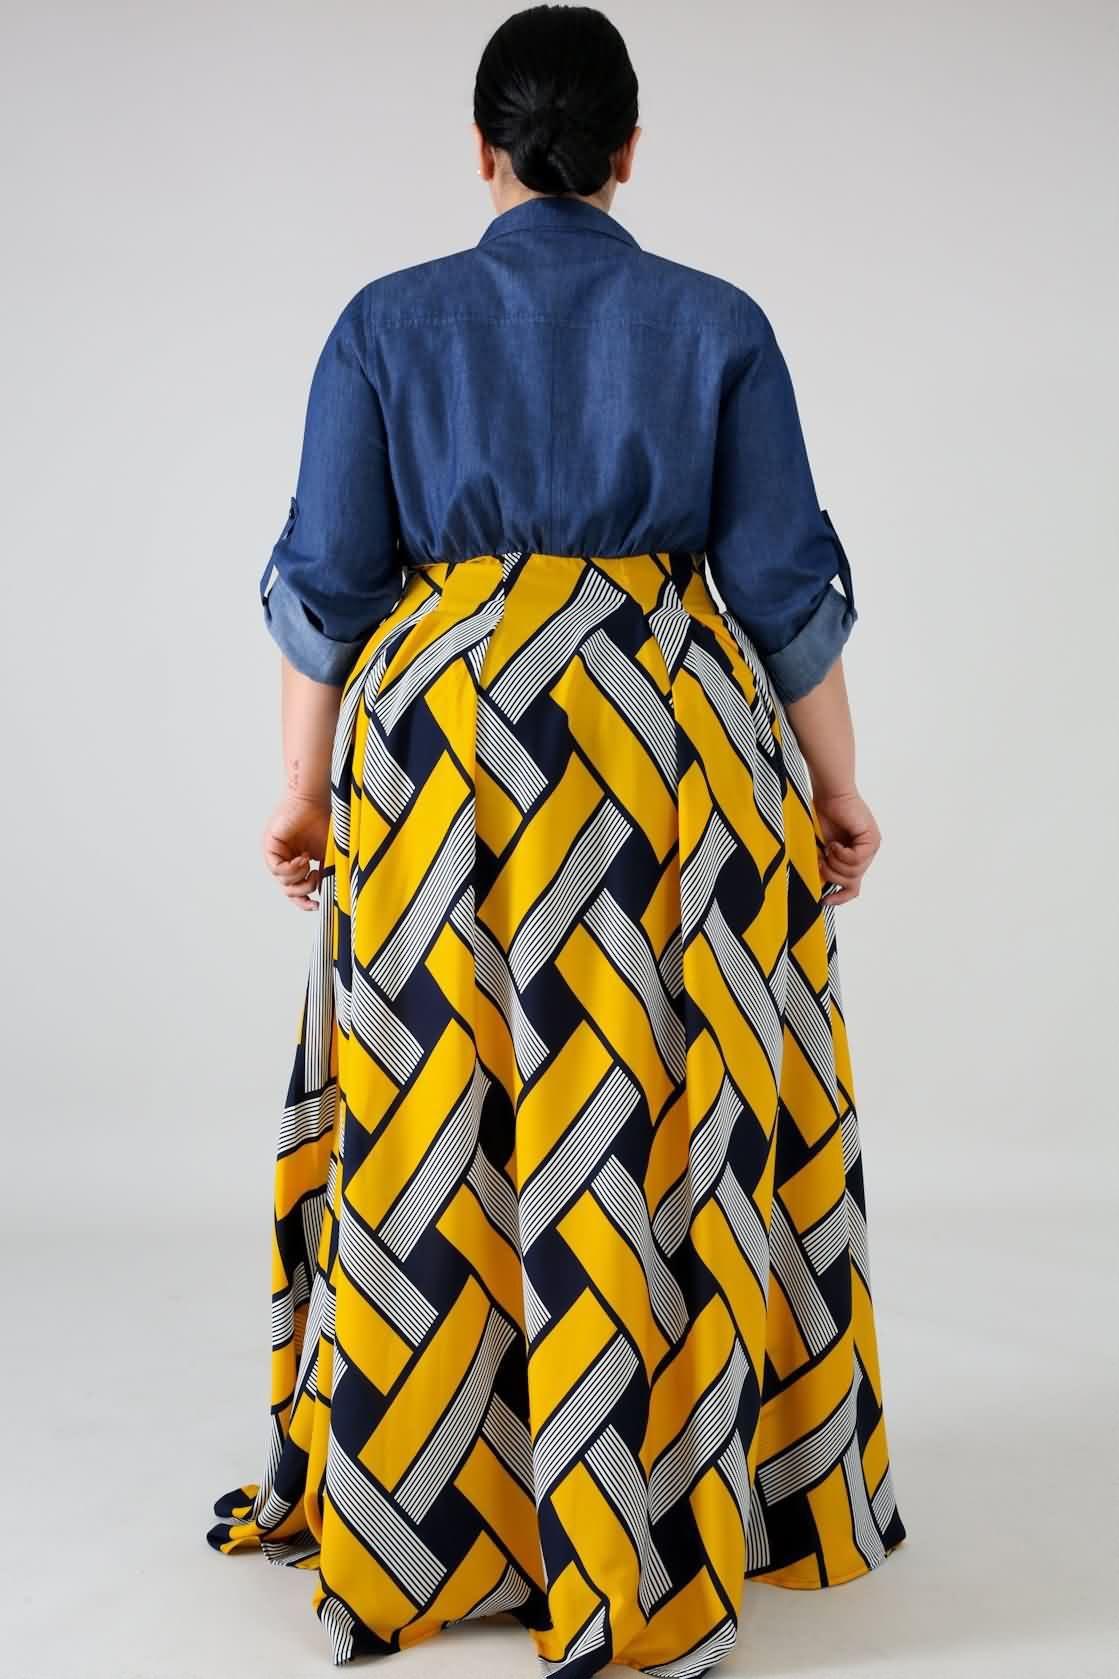 ac240df136 Women Yellow Tribal Print Button Up Casual Plus Size Maxi Shirt Dress - XL